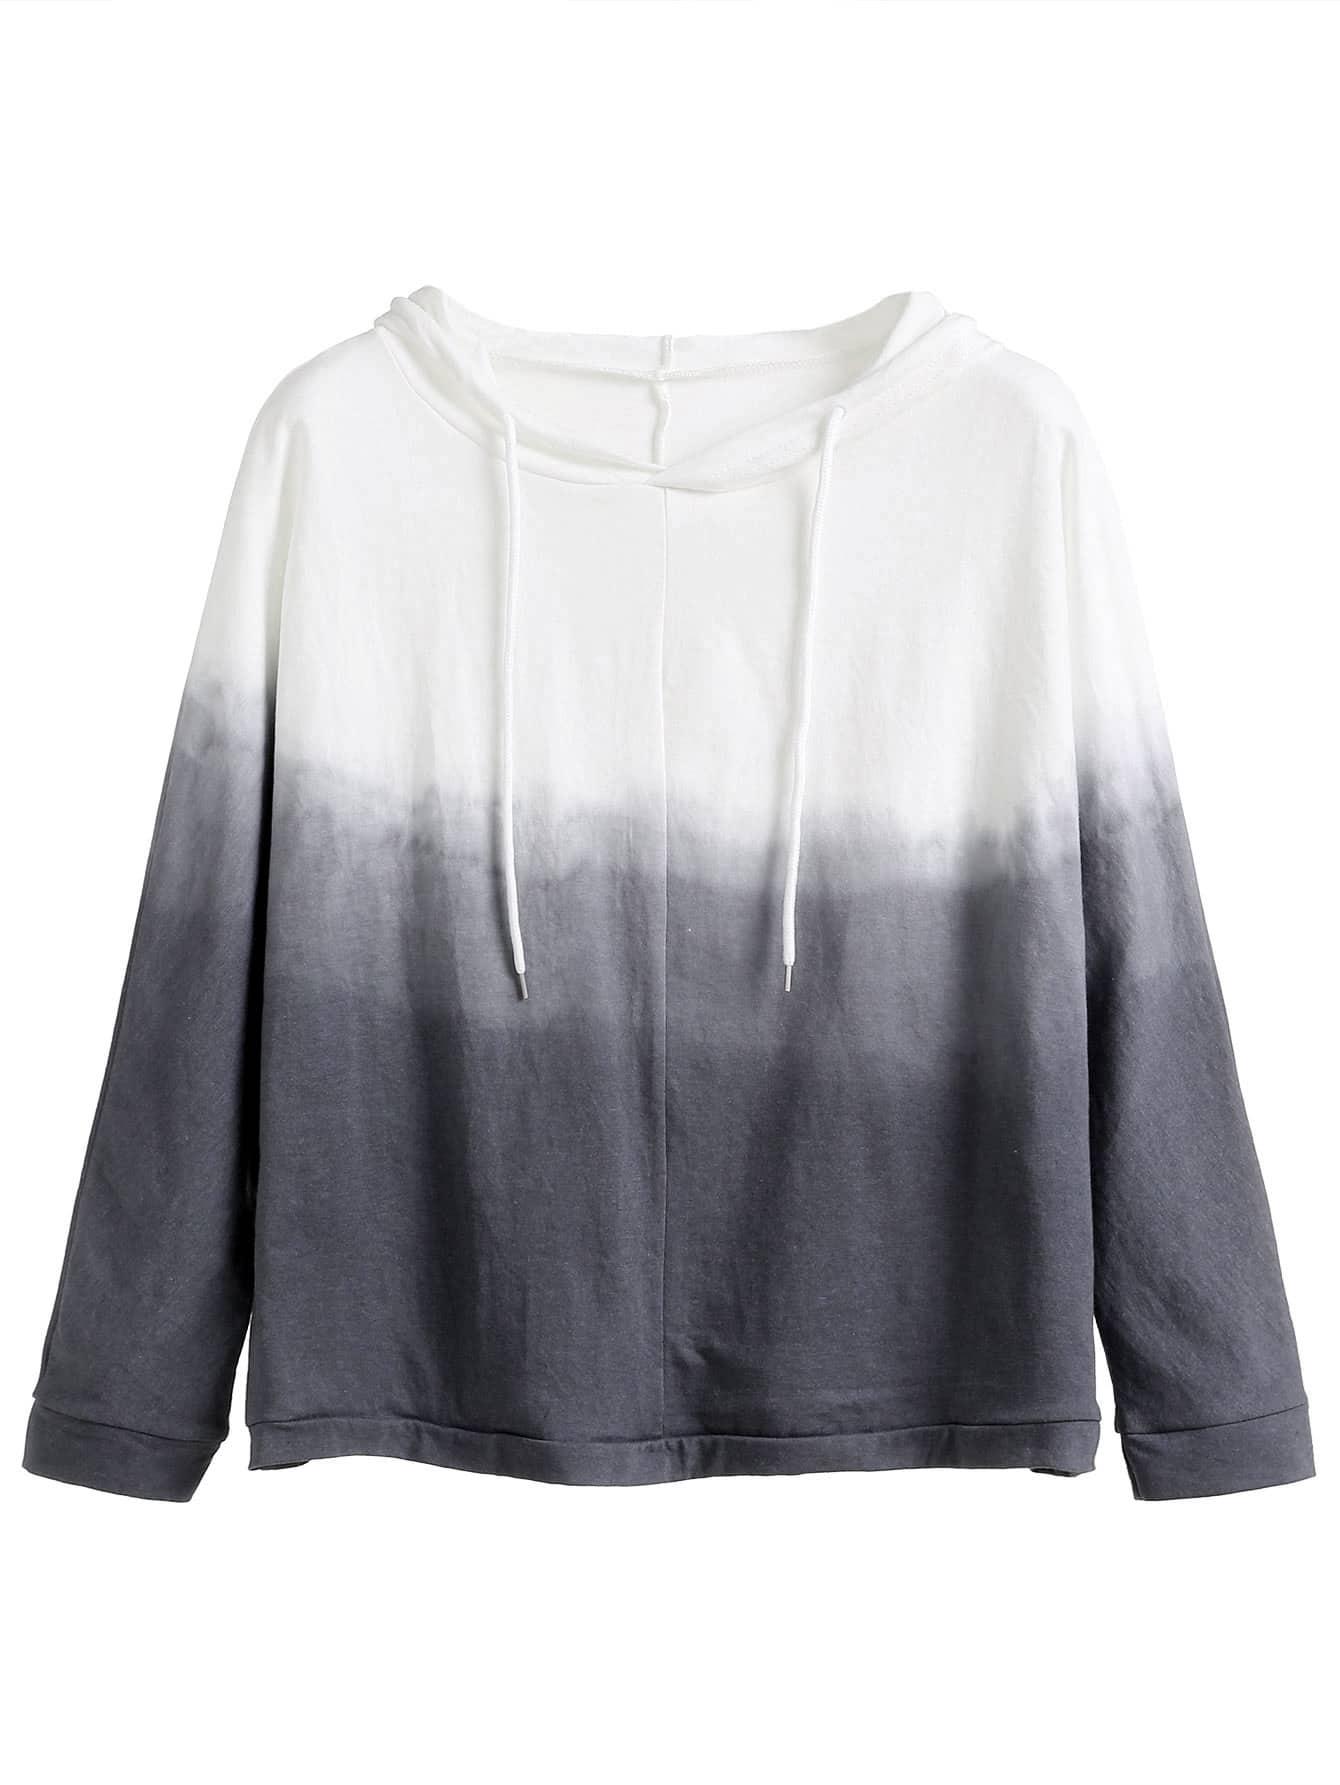 Grey Ombre Hooded Sweatshirt